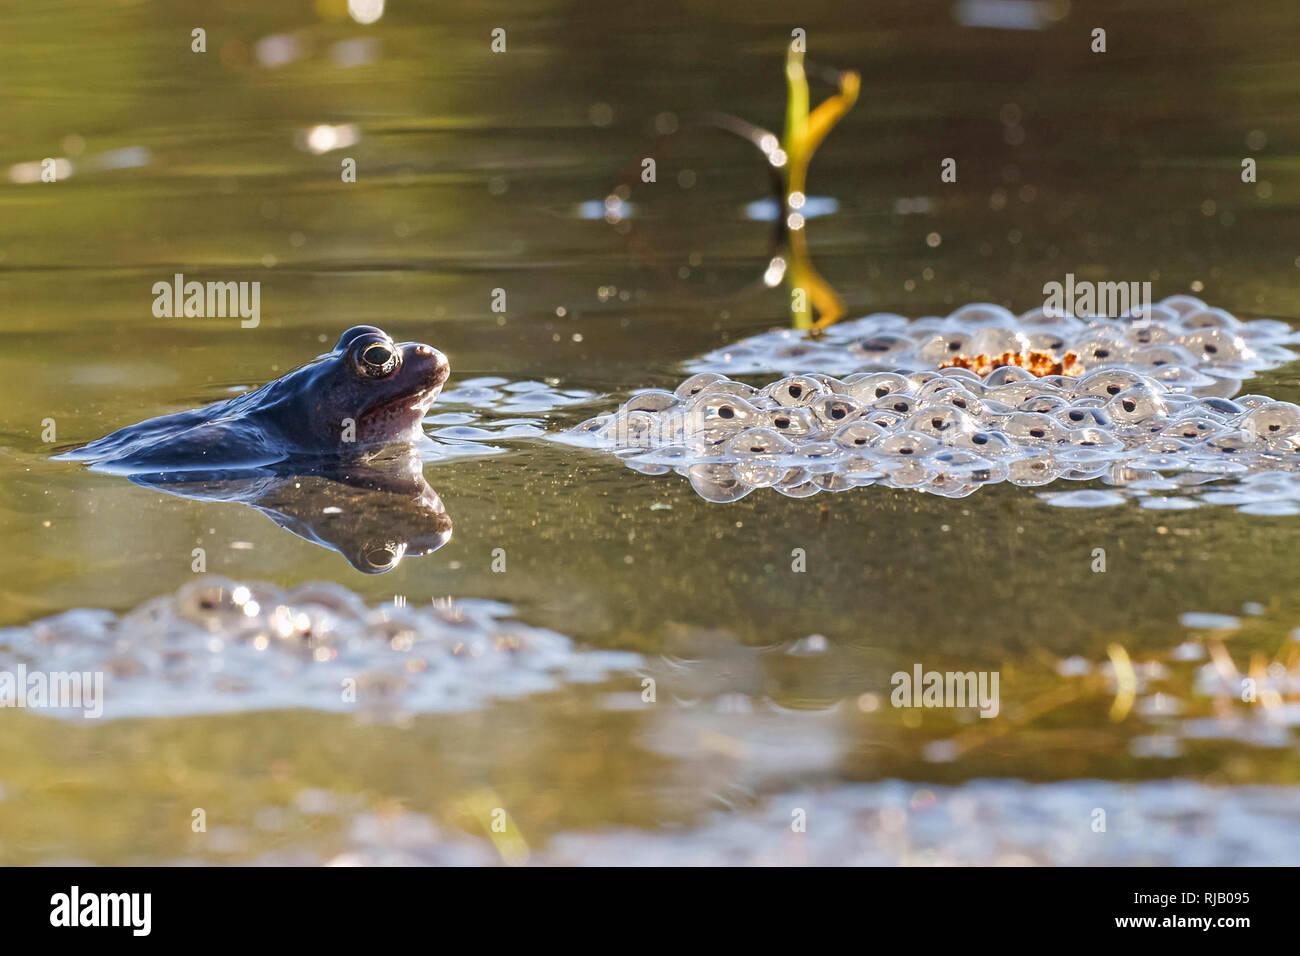 Frog spawning time - Stock Image